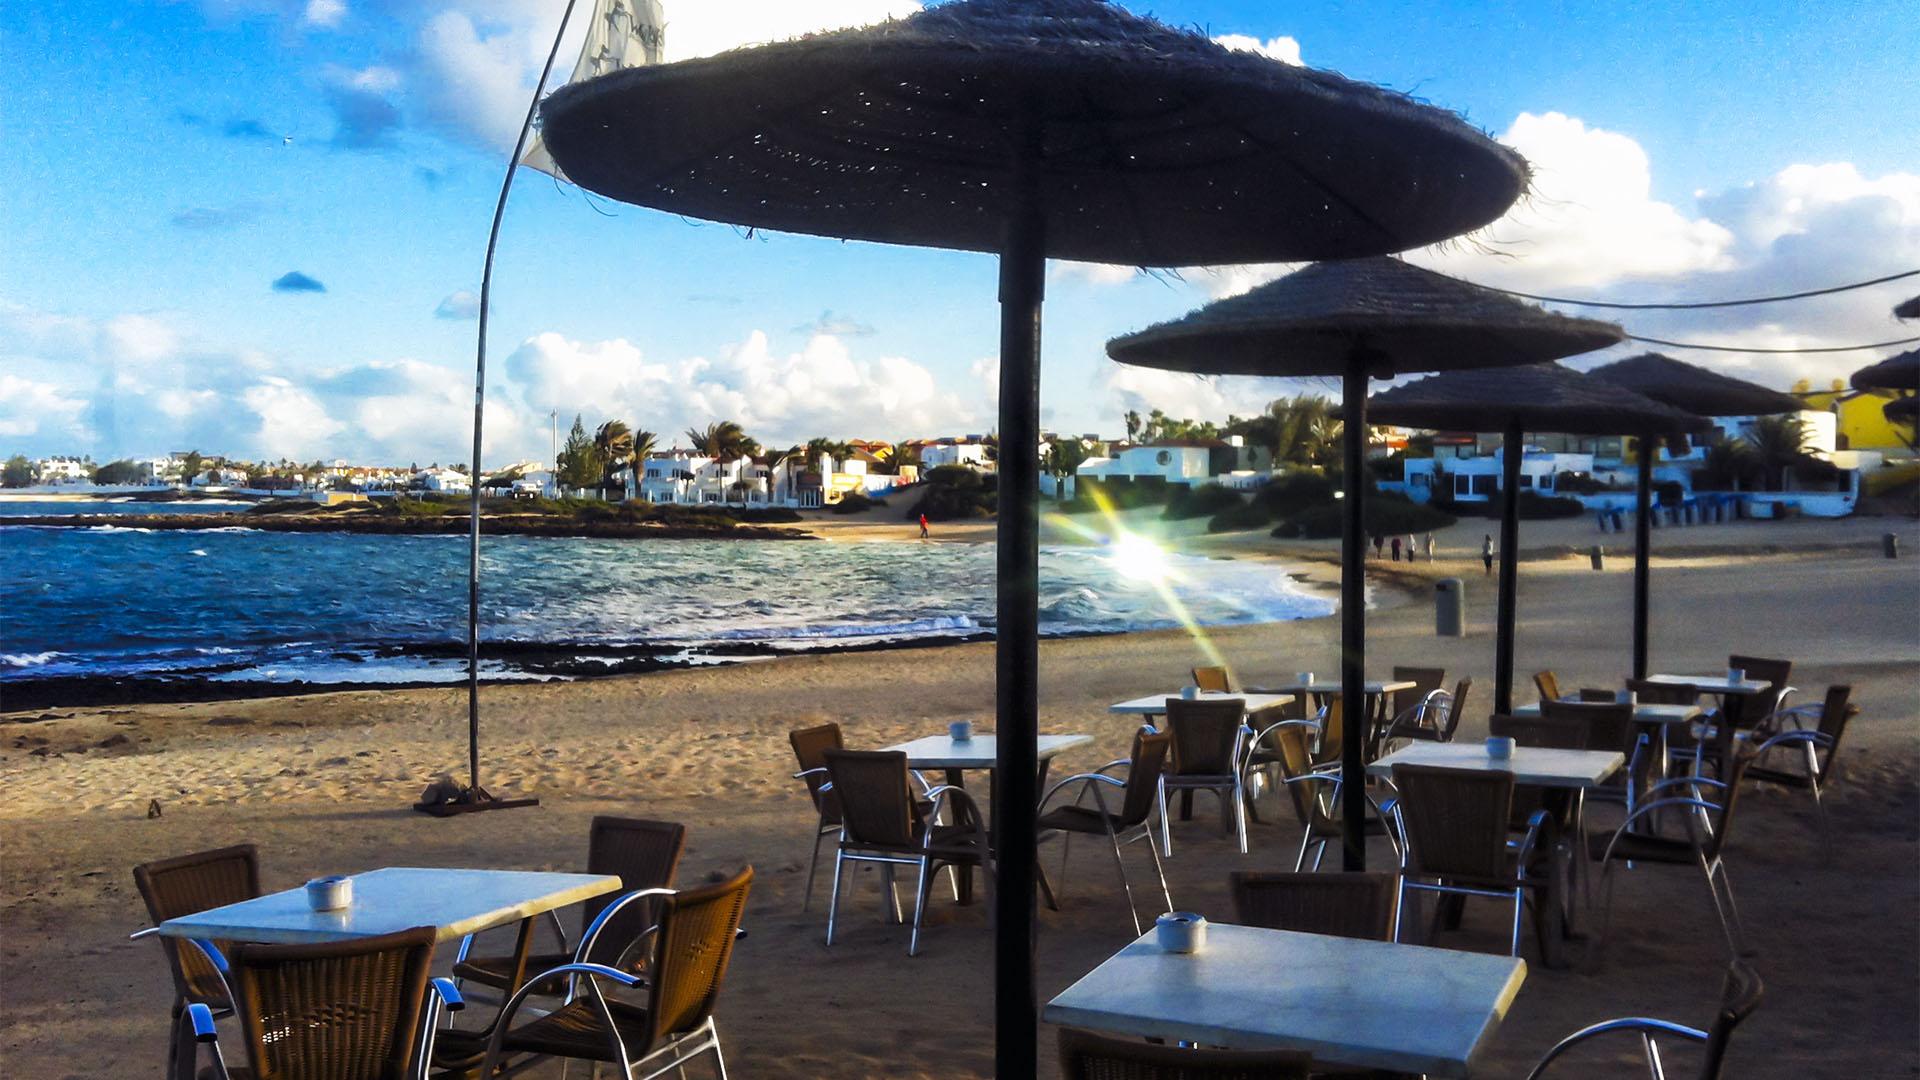 Sundowner im Waikiki Playa de Corralejo Viejo Fuerteventura.